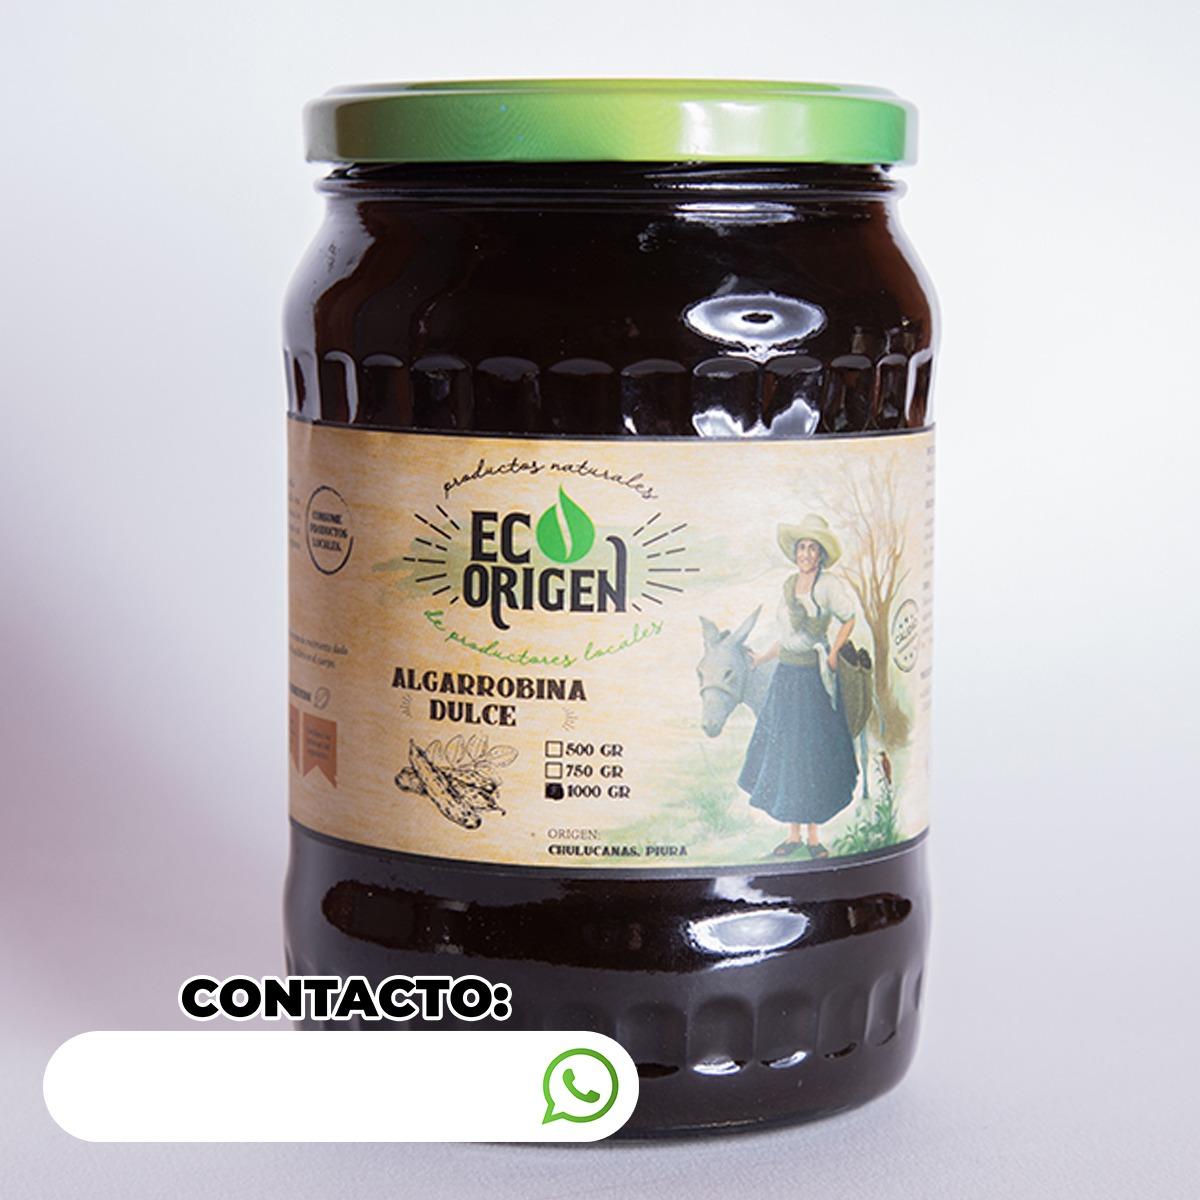 Algarrobina dulce Eco Origen x 1000 gr. Publicitario